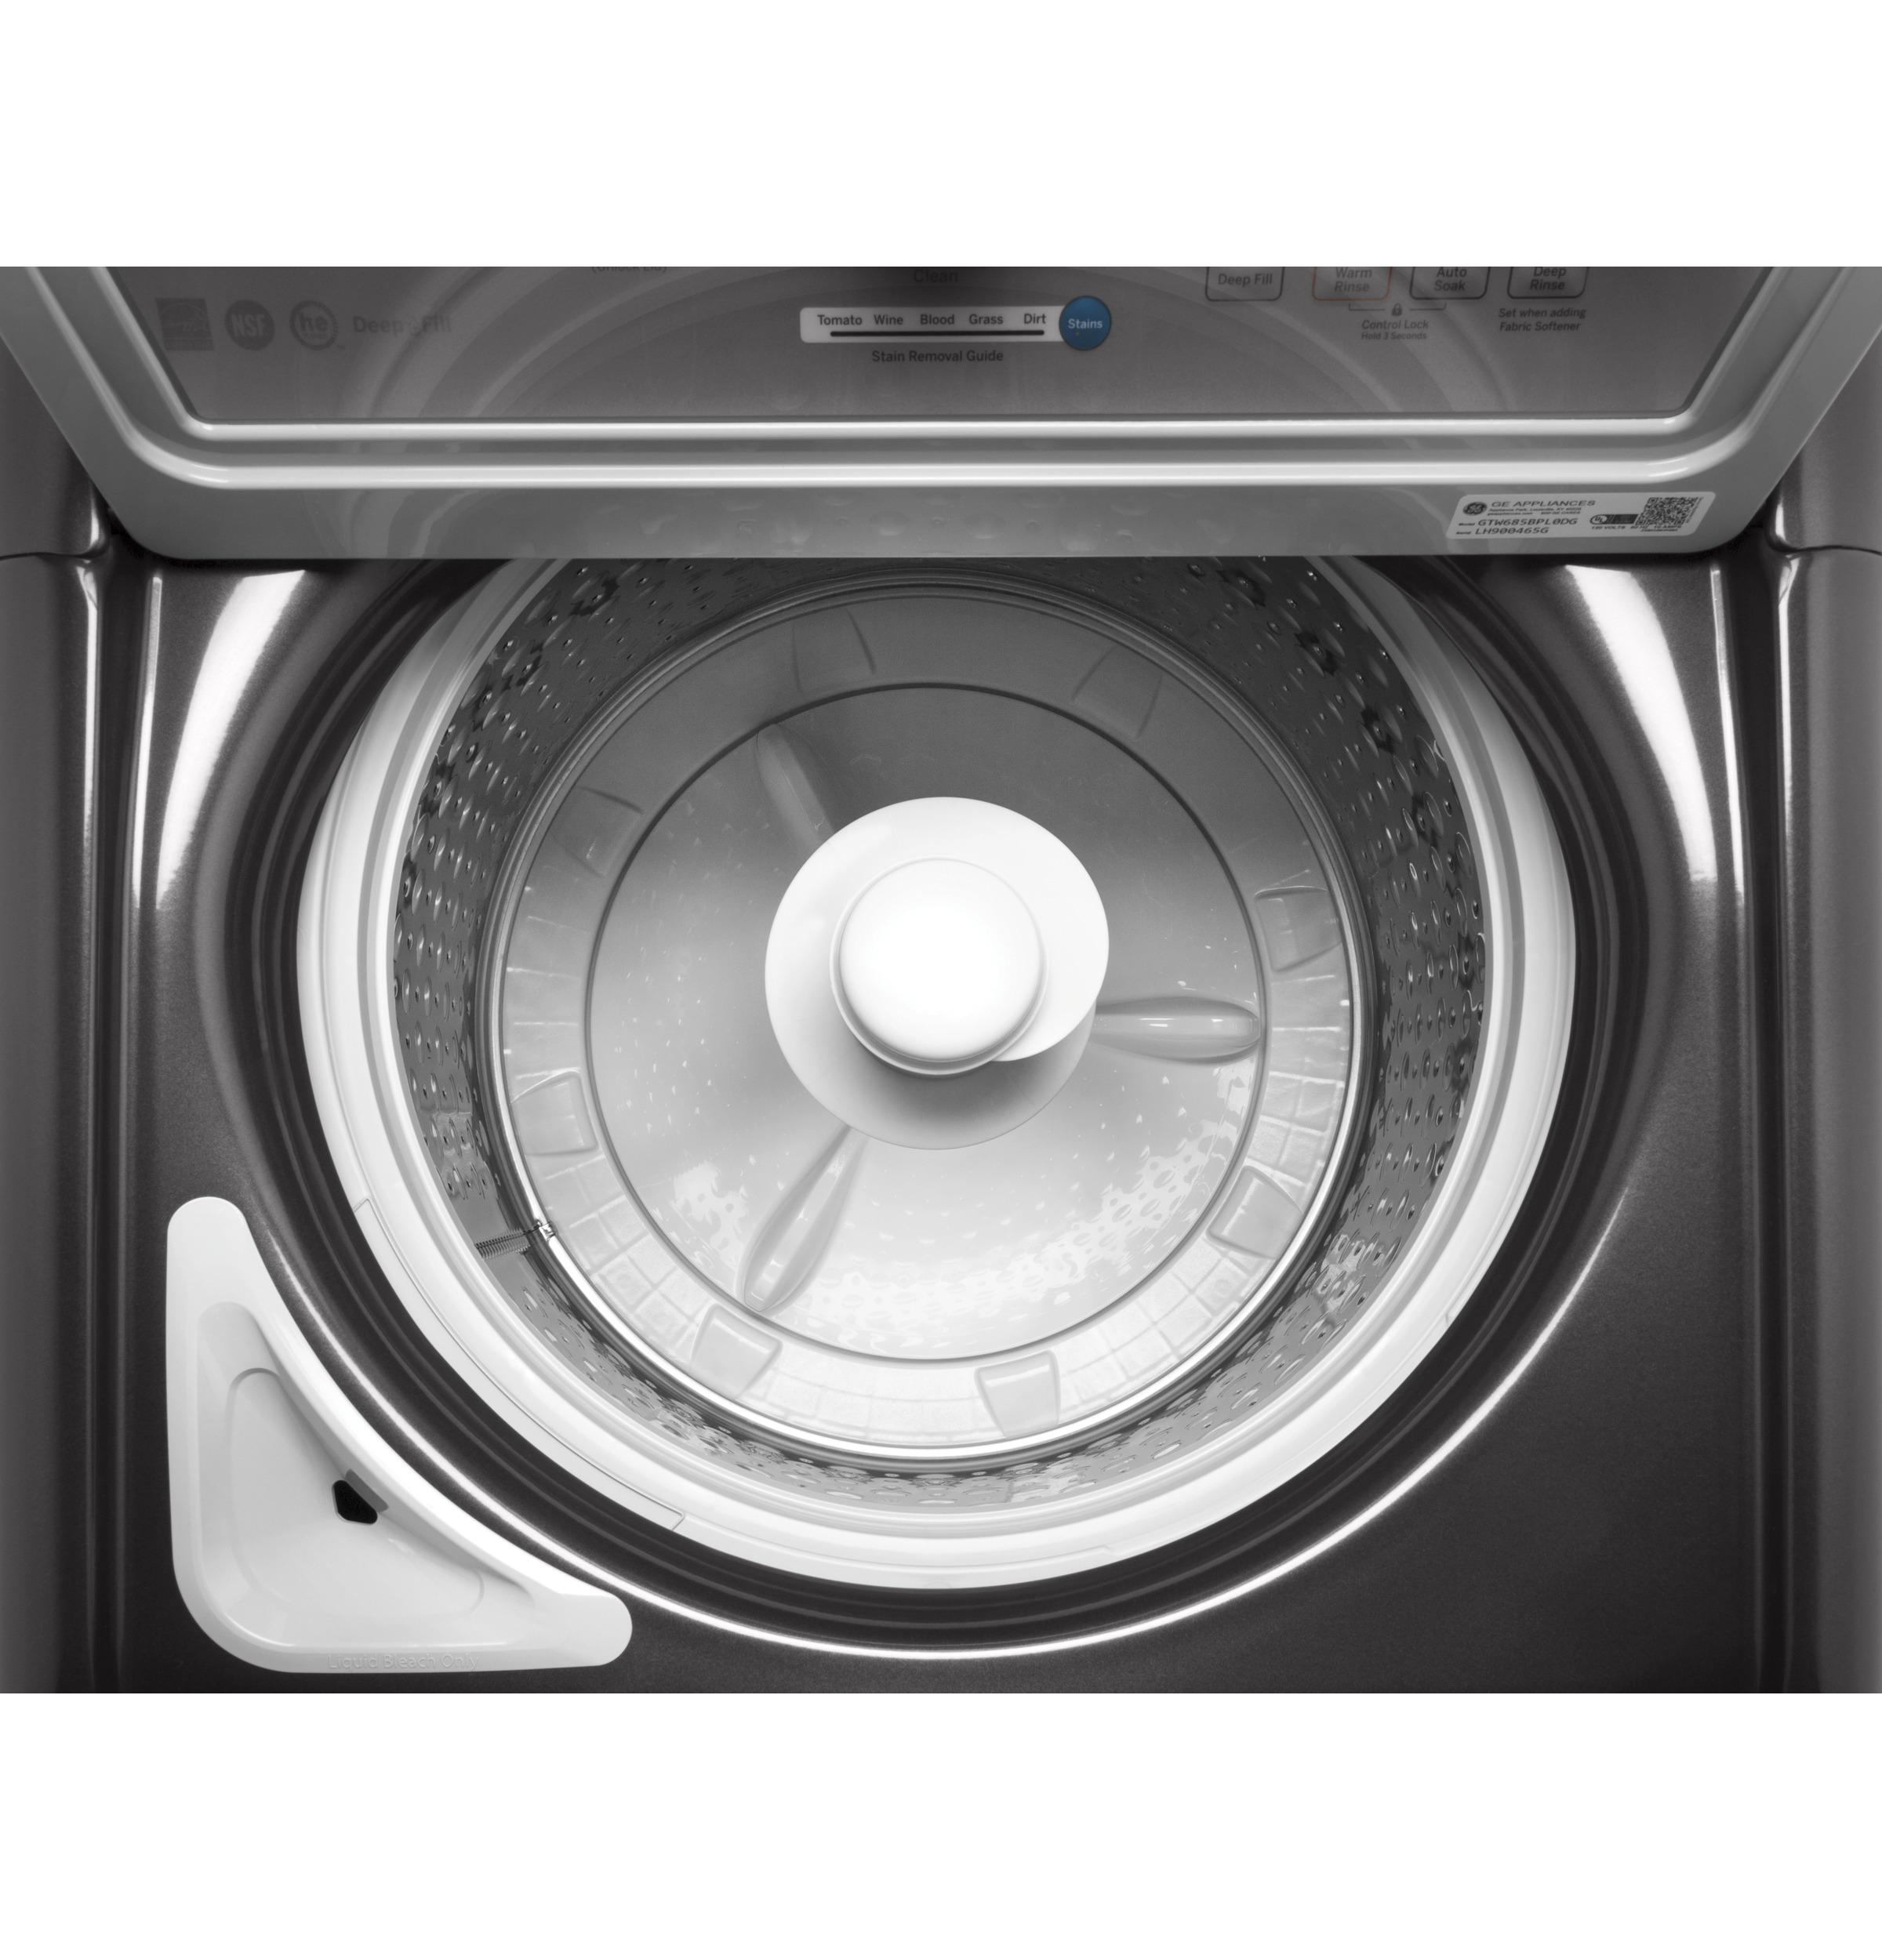 Model: GTW685BPLDG | GE GE® 4.5  cu. ft. Capacity Washer with Stainless Steel Basket